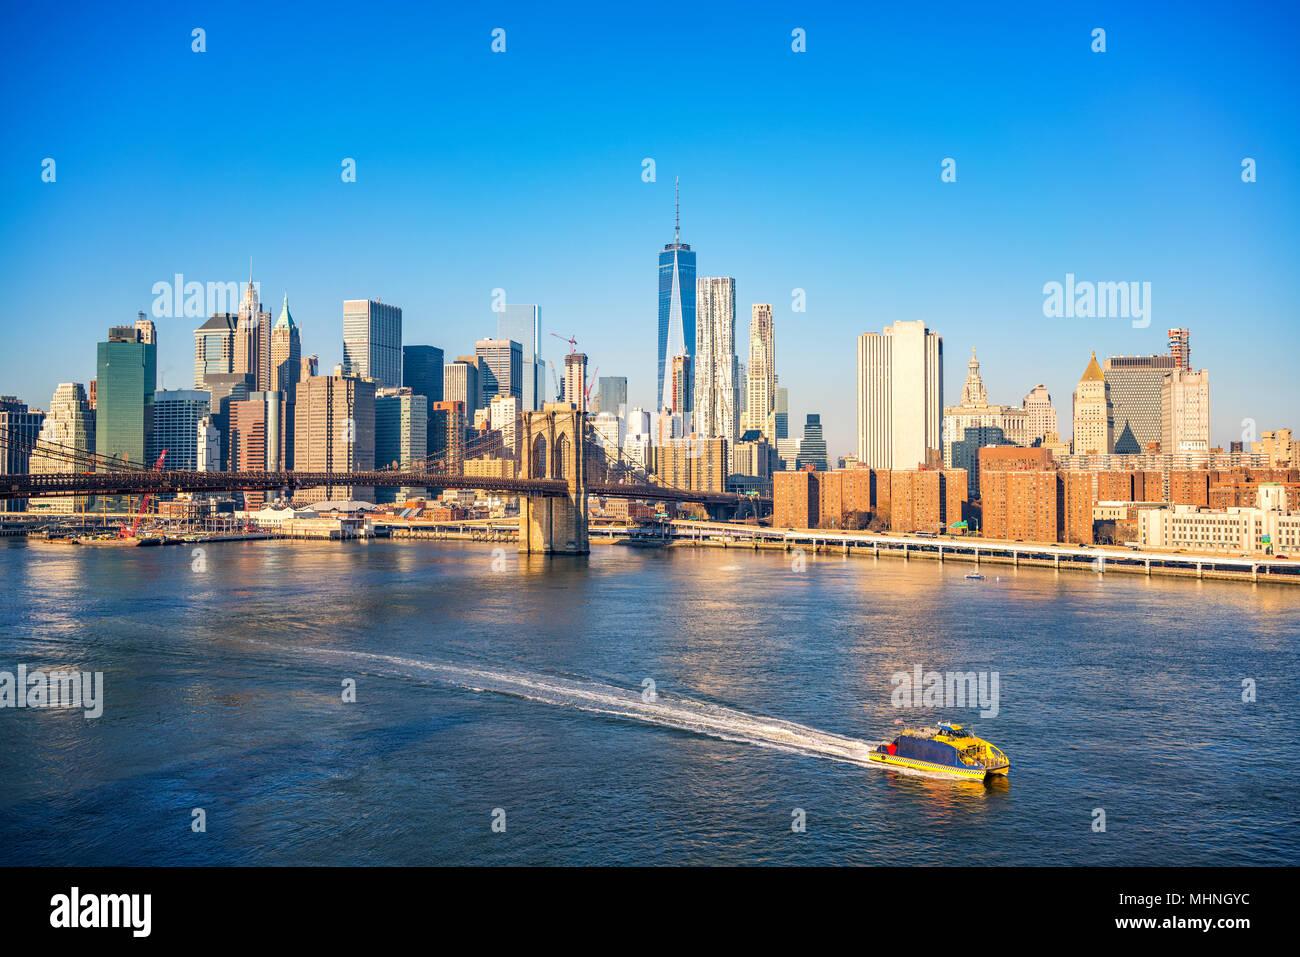 Brooklyn bridge and Manhattan at sunny day - Stock Image